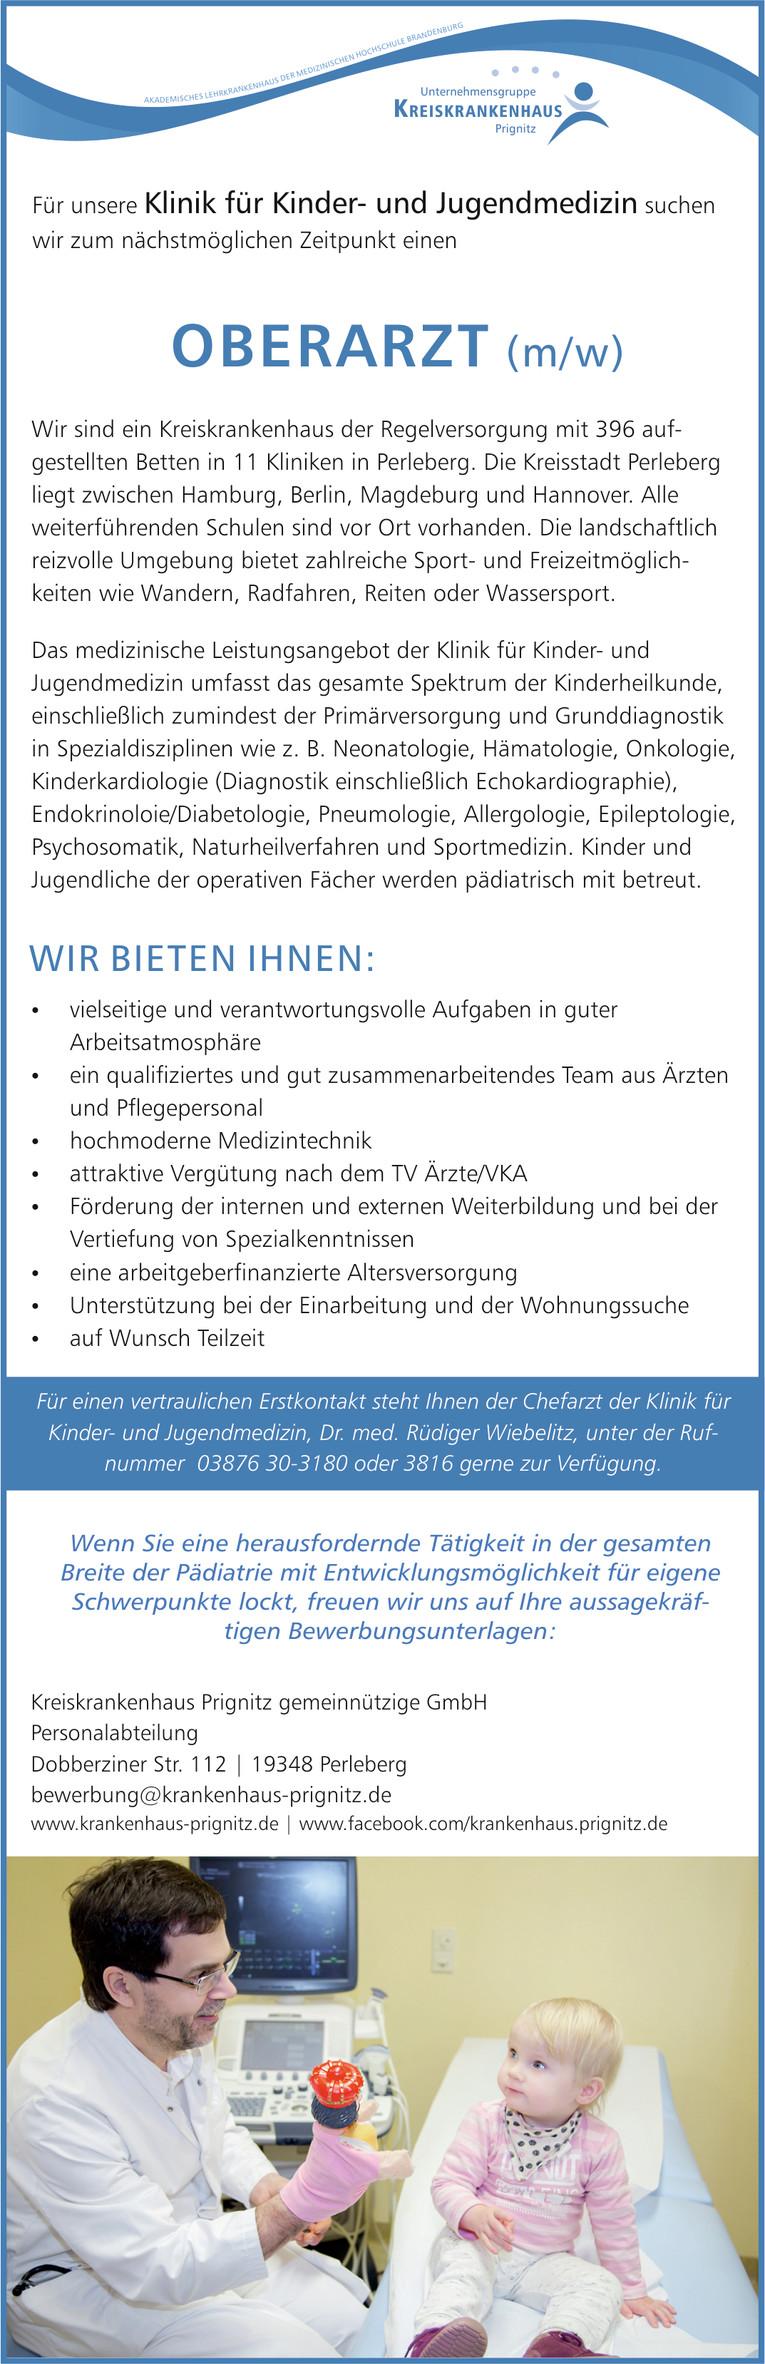 Oberarzt (m/w) | Klinik für Kinder- und Jugendmedizin in Perleberg